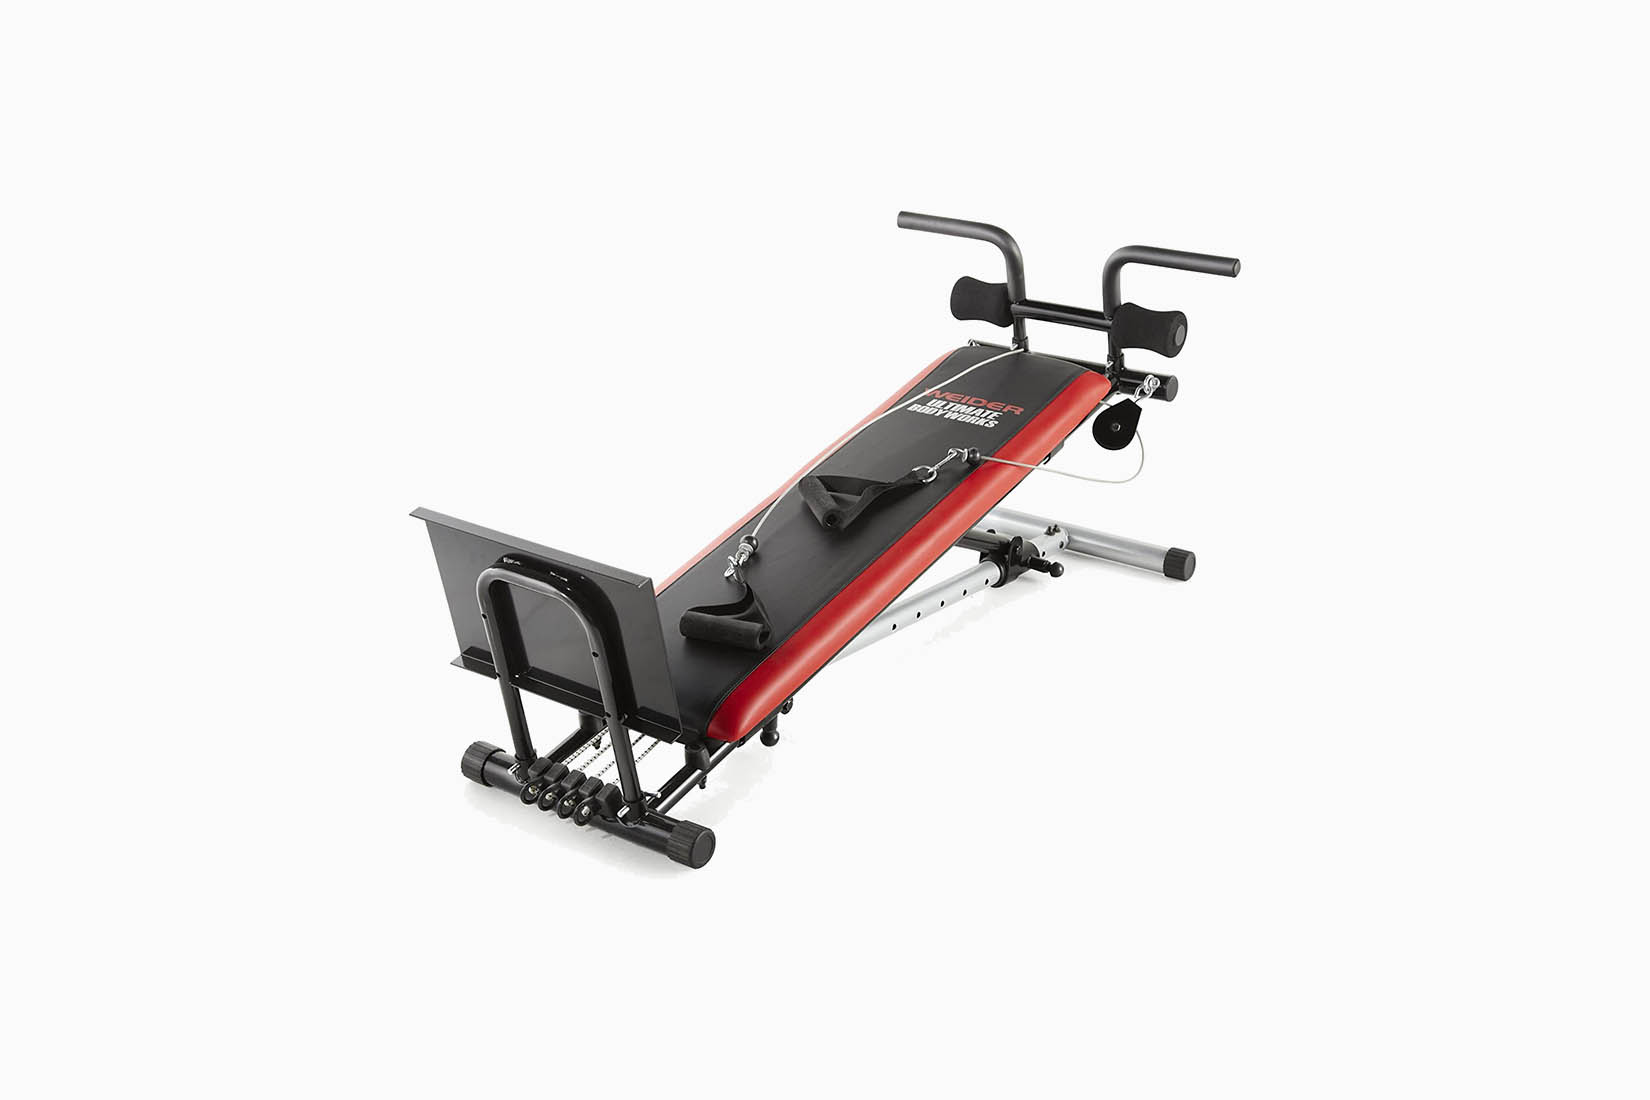 best home gym equipment weider review - luxe digital